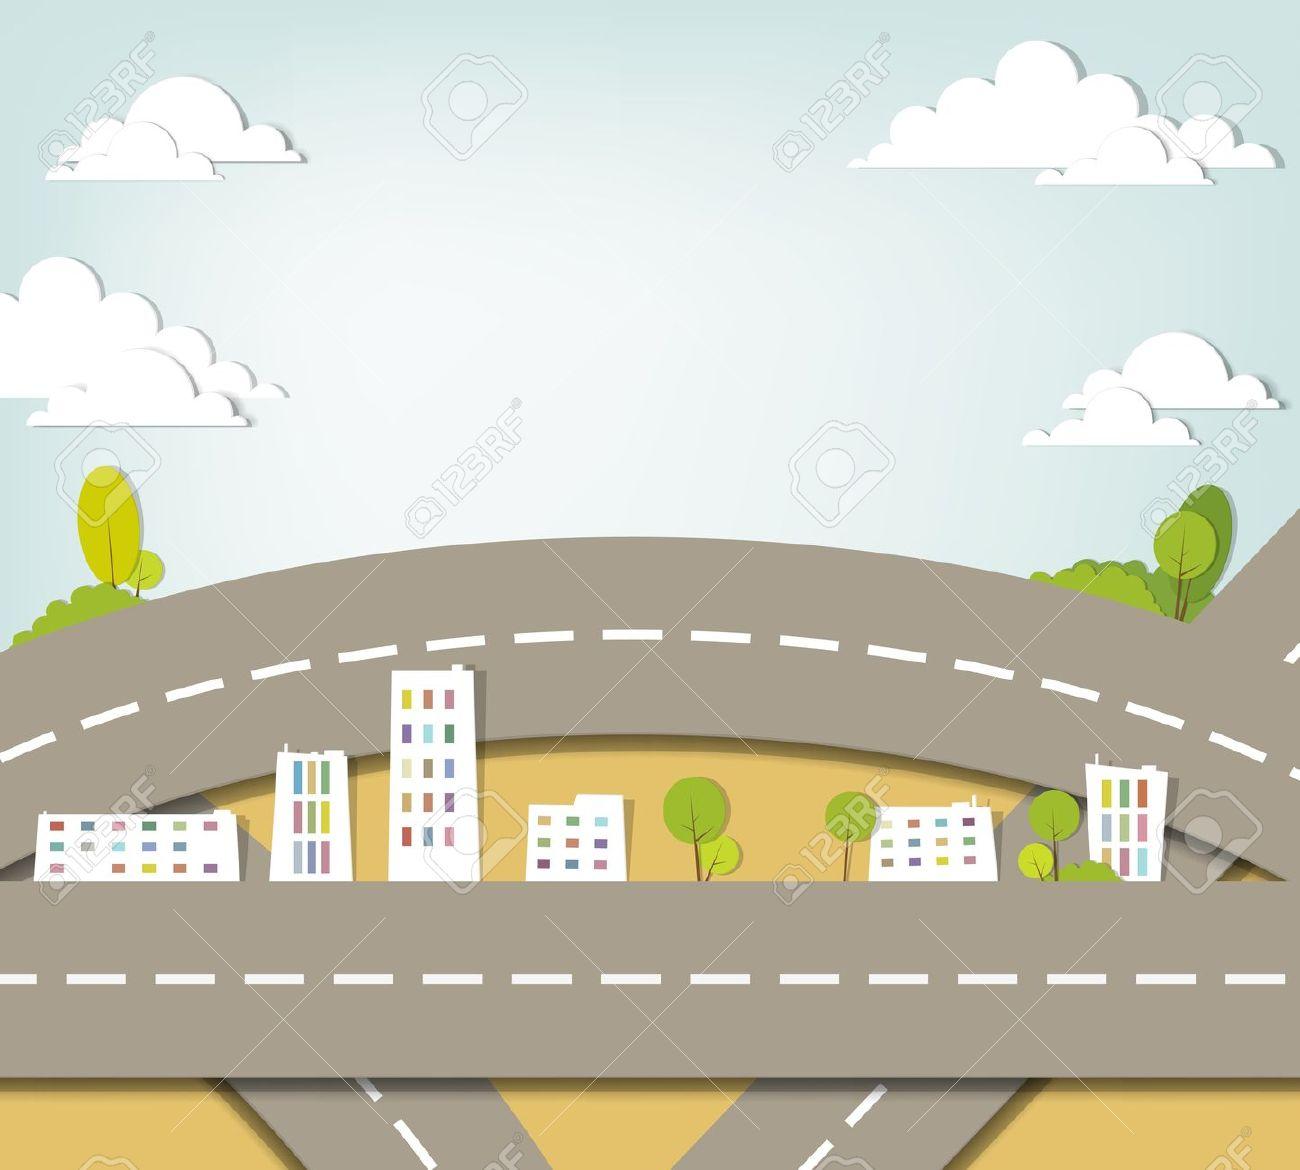 Clipart road landscape. Clip art library